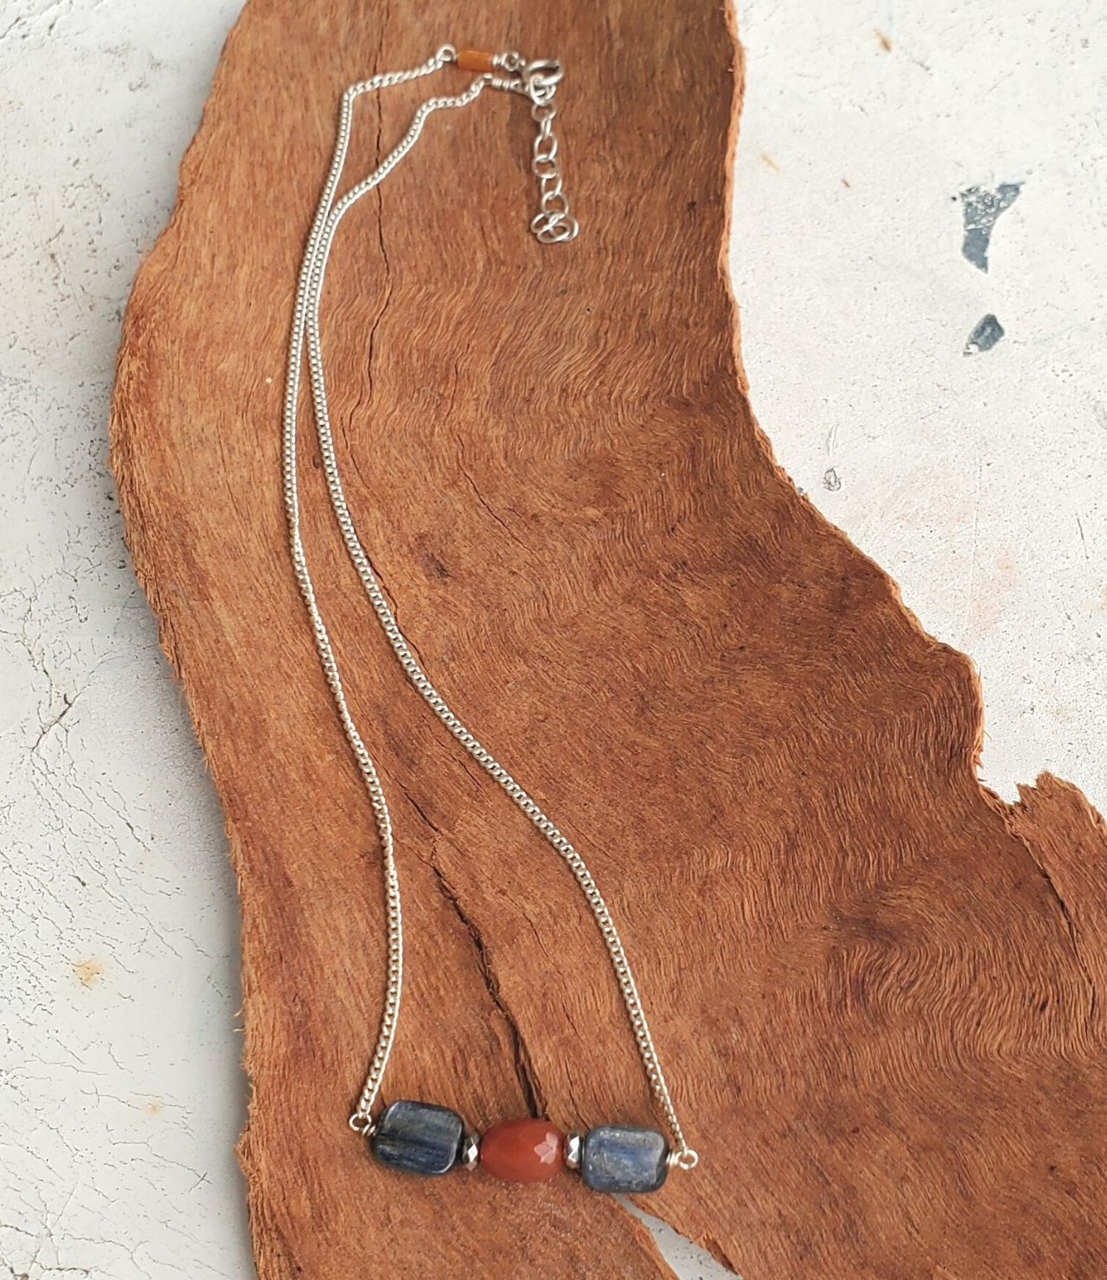 silver chain blue orange gemstone necklace on wood